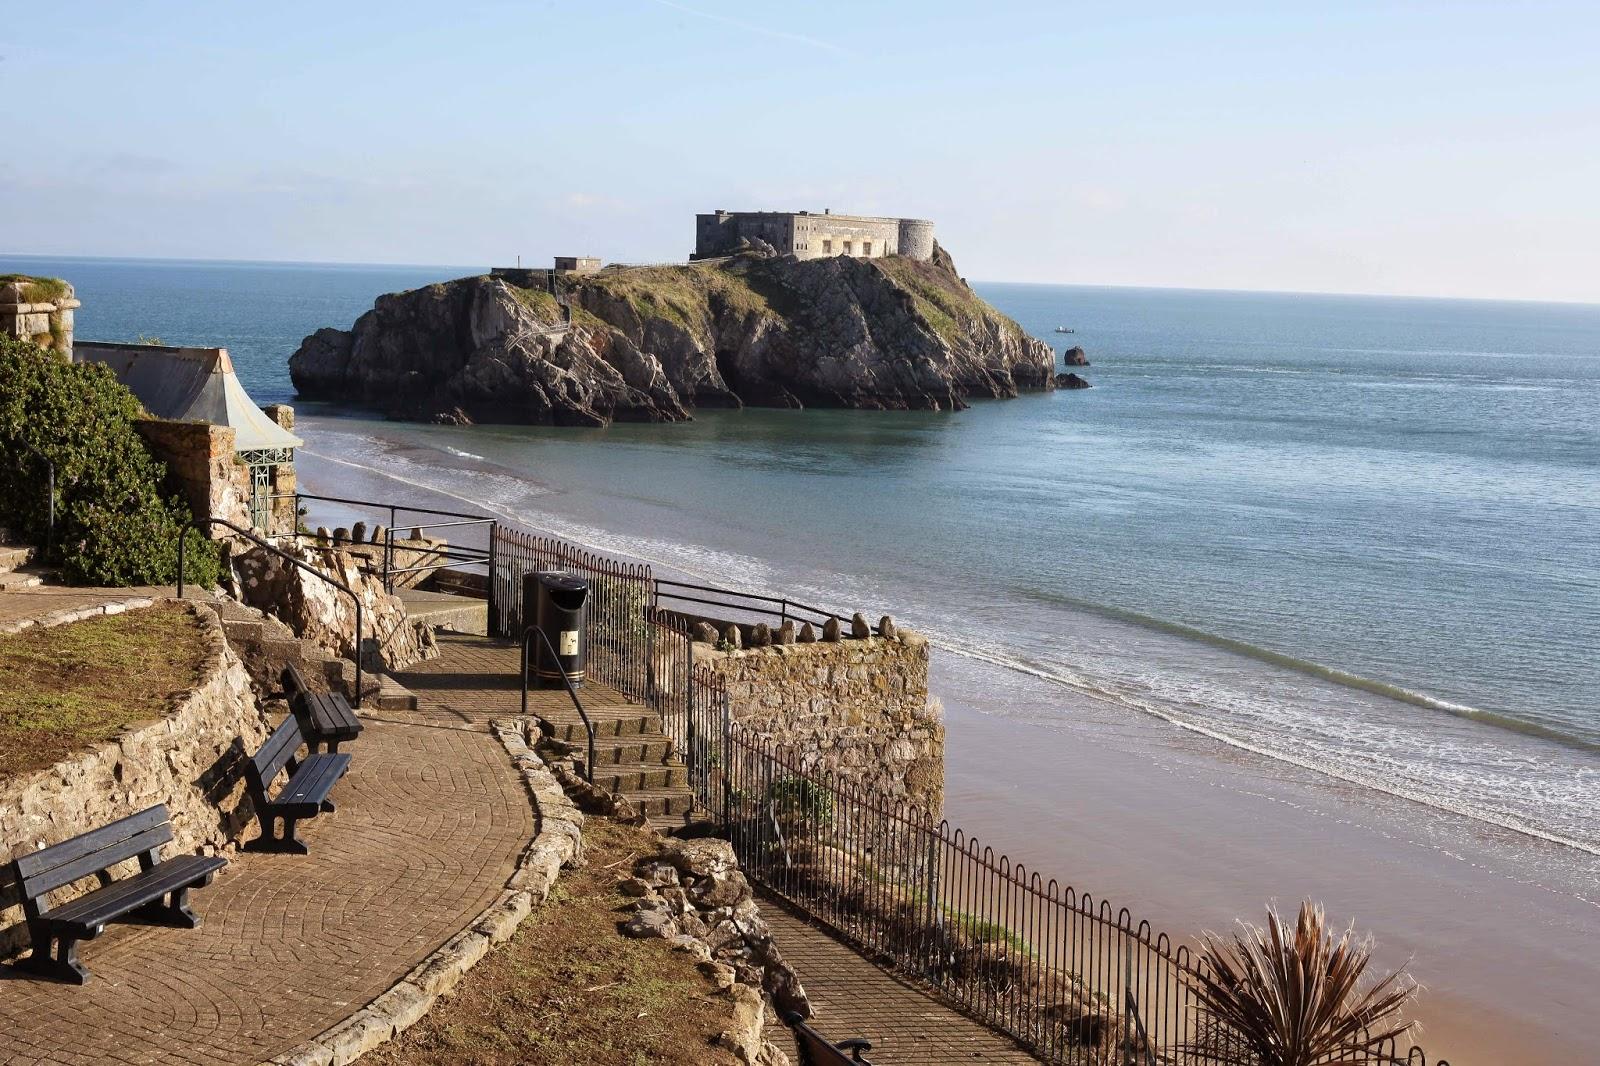 West Wales coastline